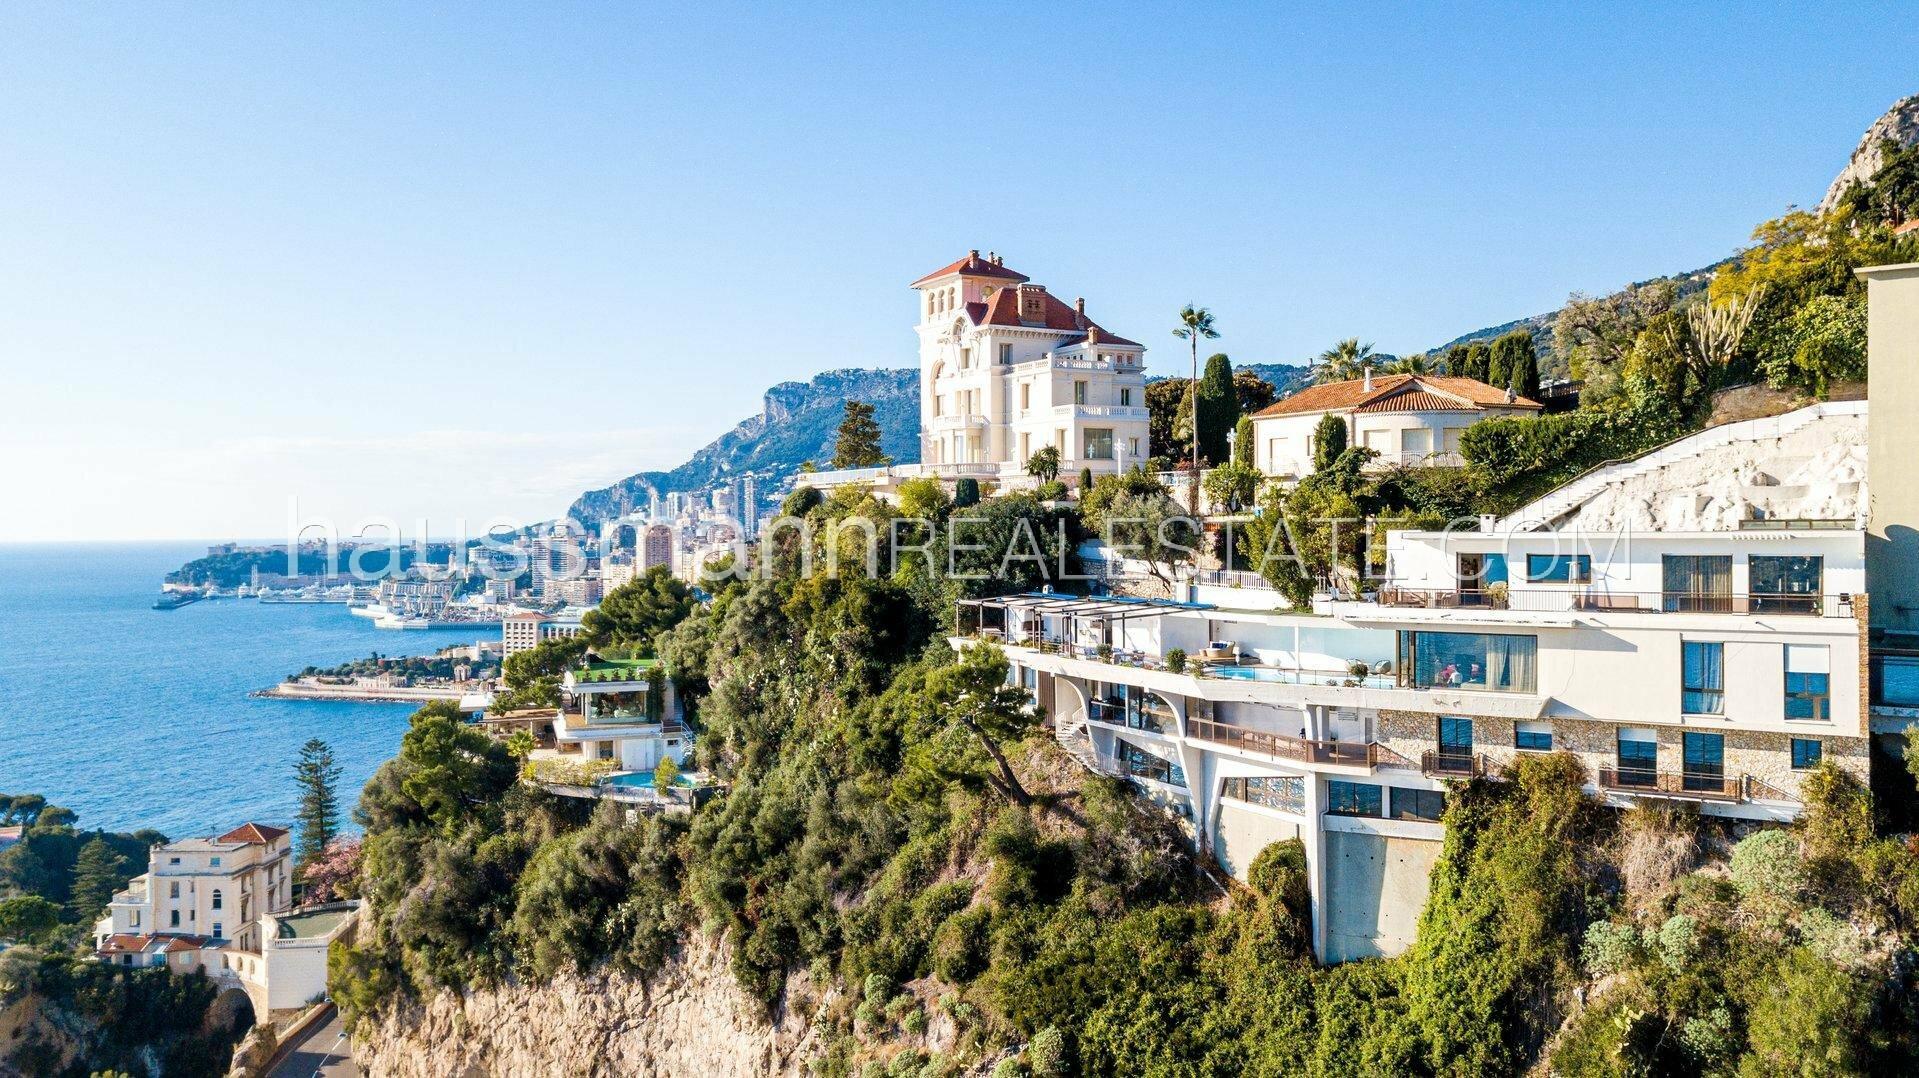 Villa in Roquebrune-Cap-Martin, Provence-Alpes-Côte d'Azur, France 1 - 11159261